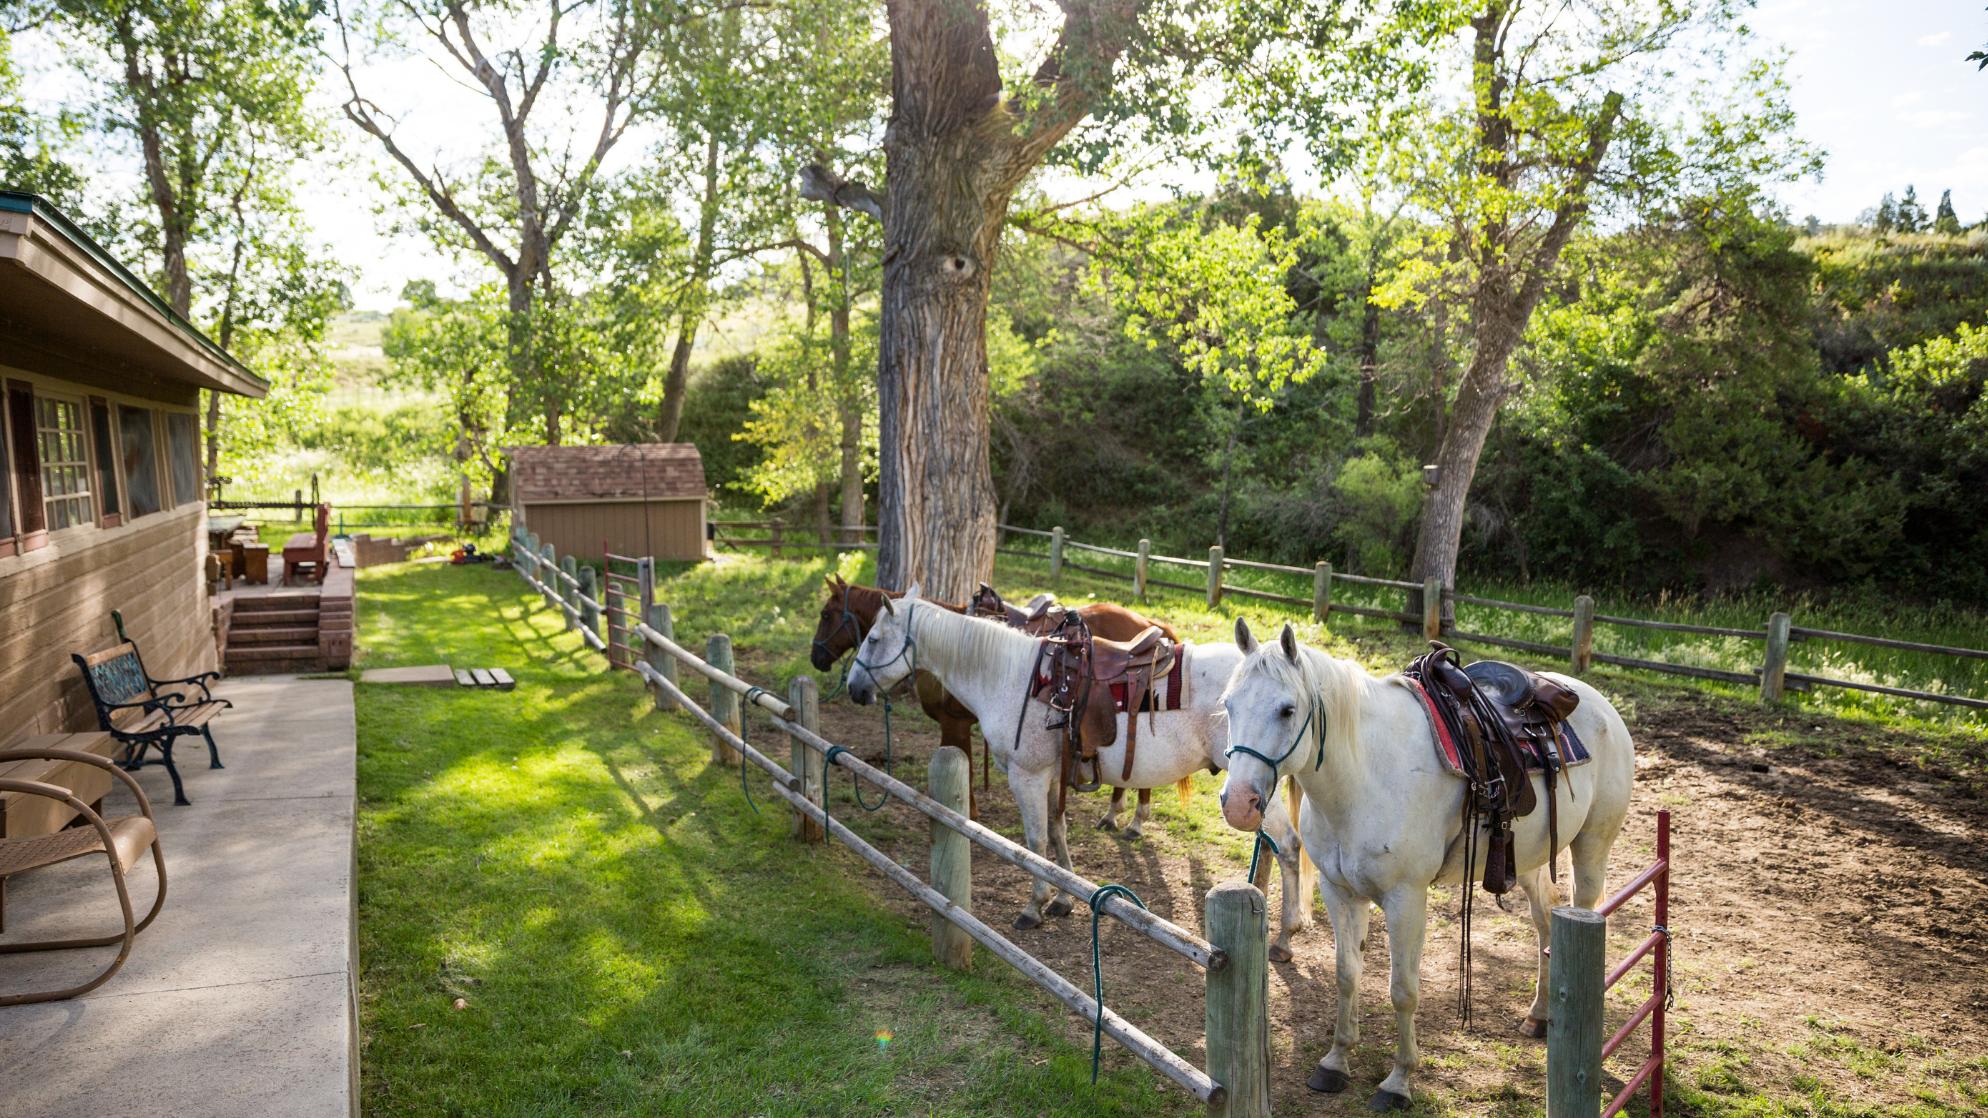 Horseback riding in Billings in the fall